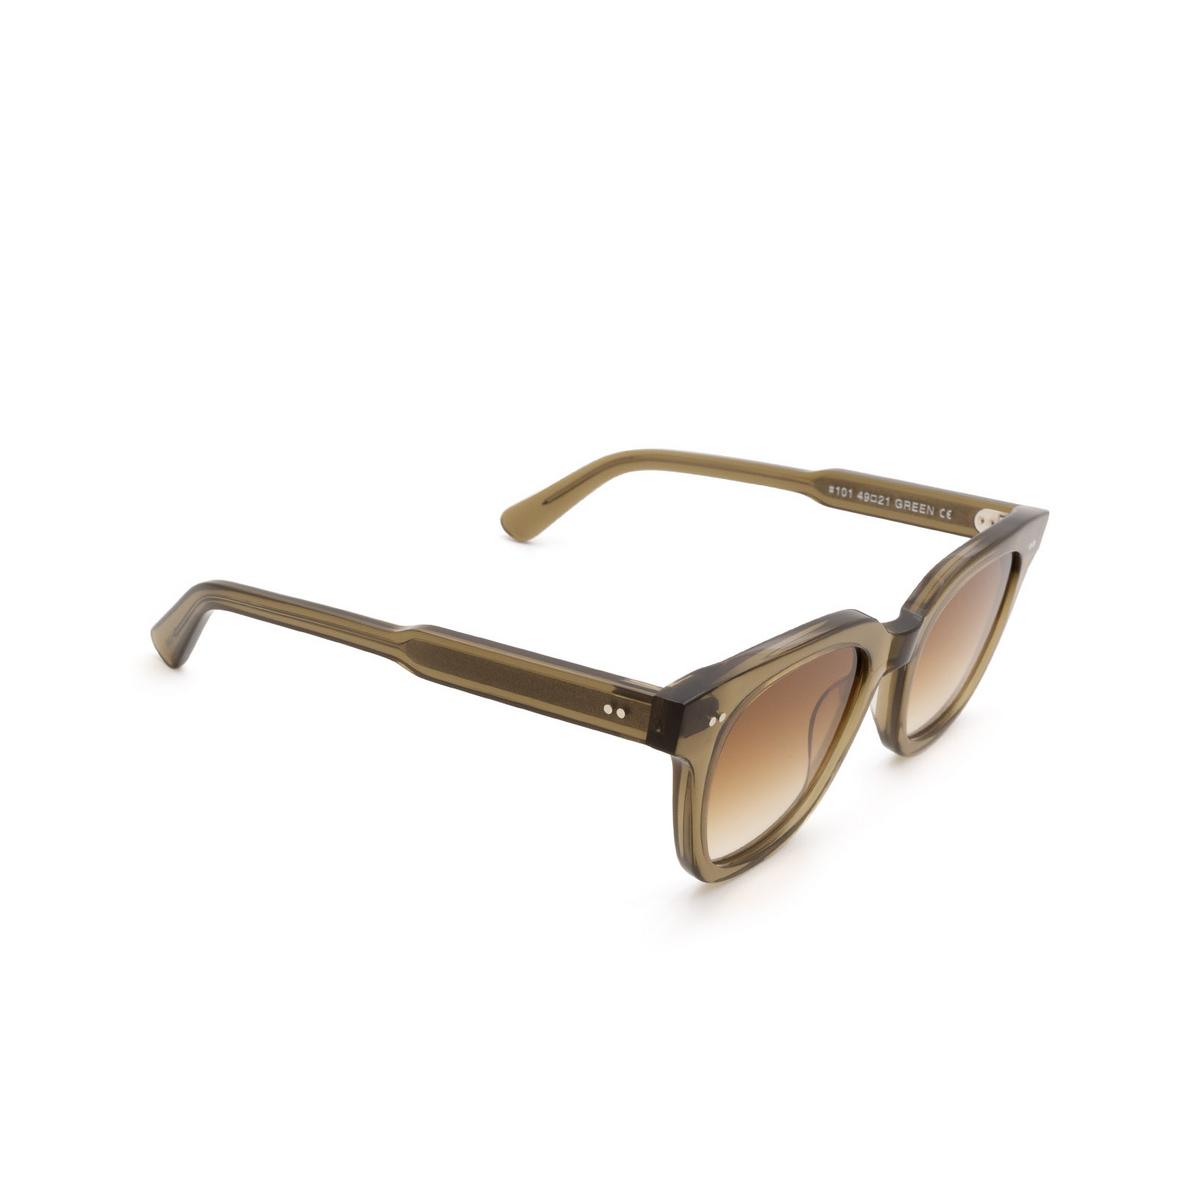 Chimi® Square Sunglasses: #101 color Olive Green Green - three-quarters view.